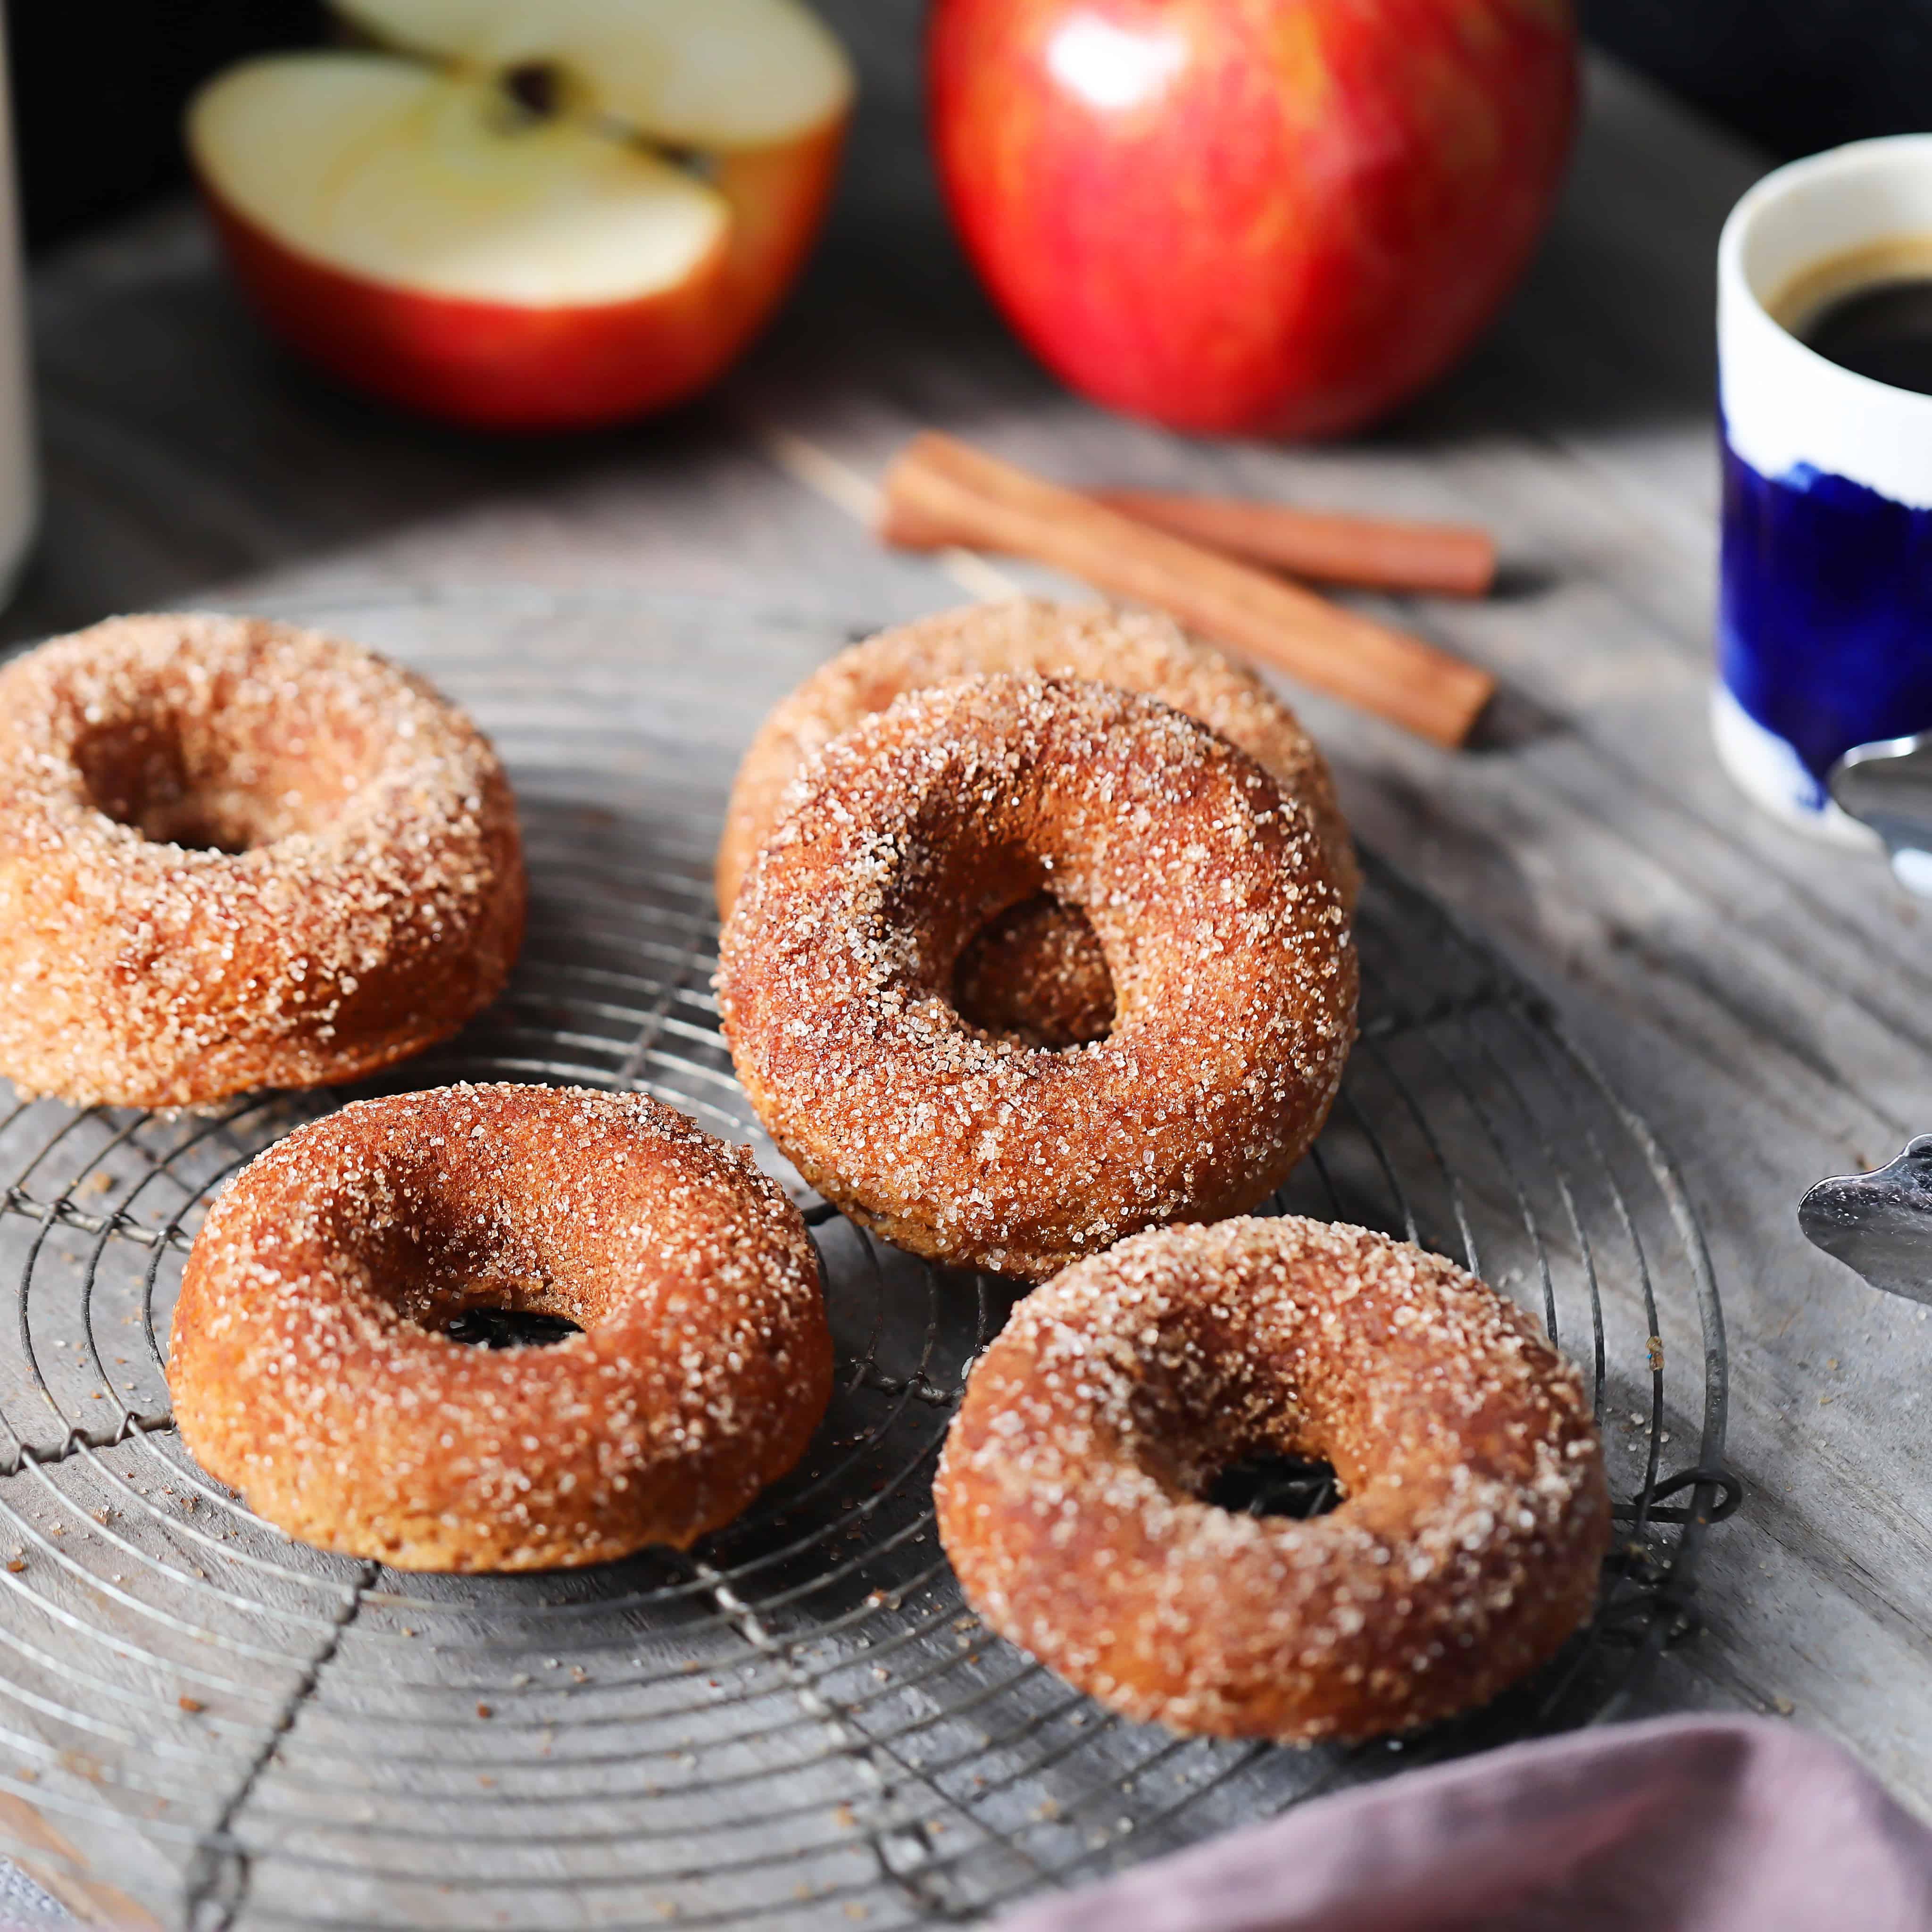 Vegan/Paleo Cinnamon Apple Donuts